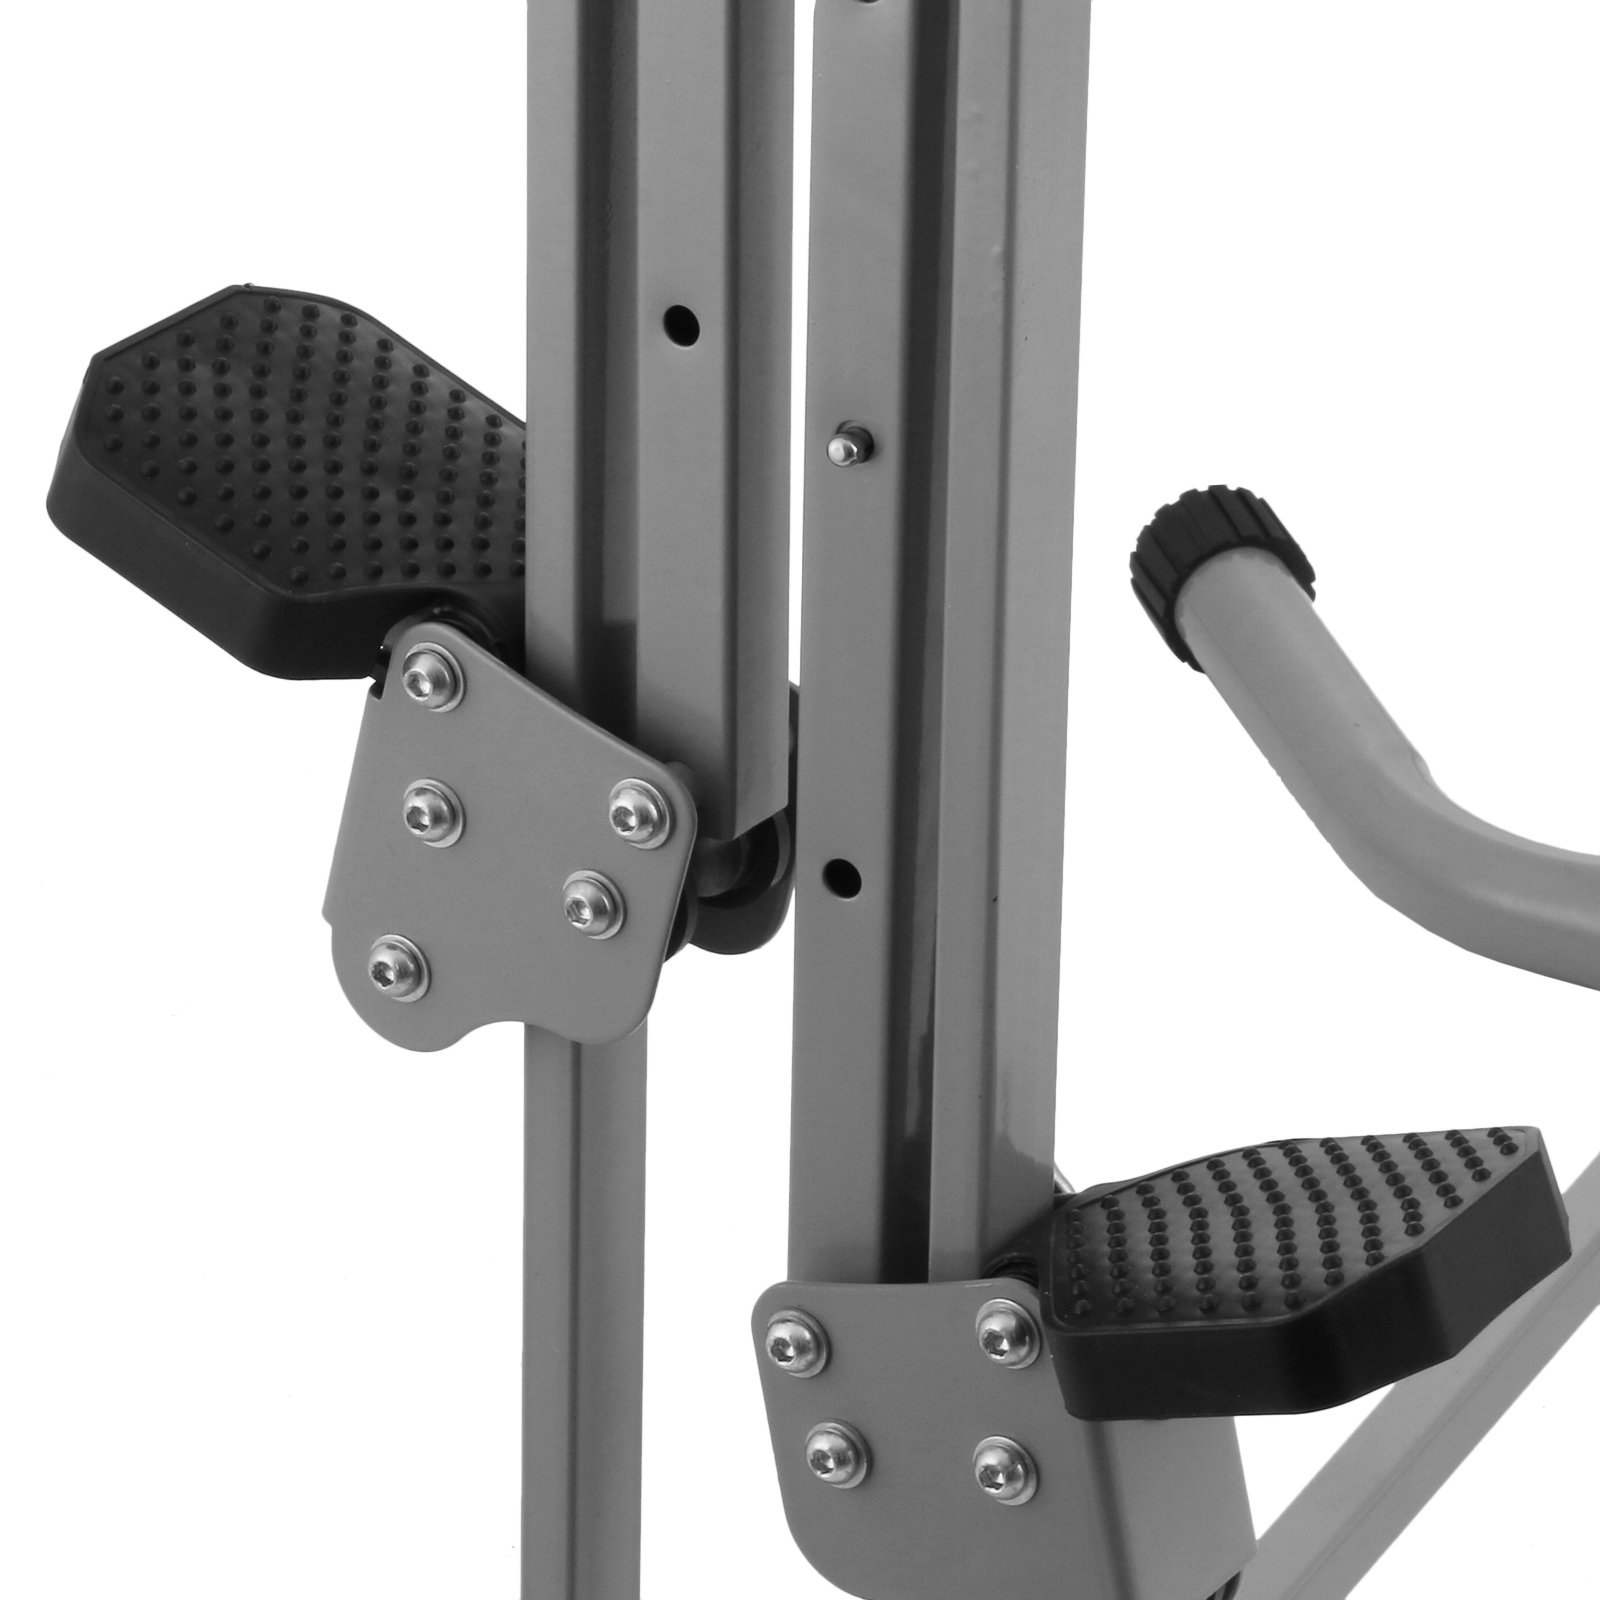 Popsport 440LBS Climber Machine Fitness Stepper Climber Exercise Equipment Vertical Climber for Home Gym Exercise Stepper Cardio Climbing System (P8006,Gray) by Popsport (Image #9)